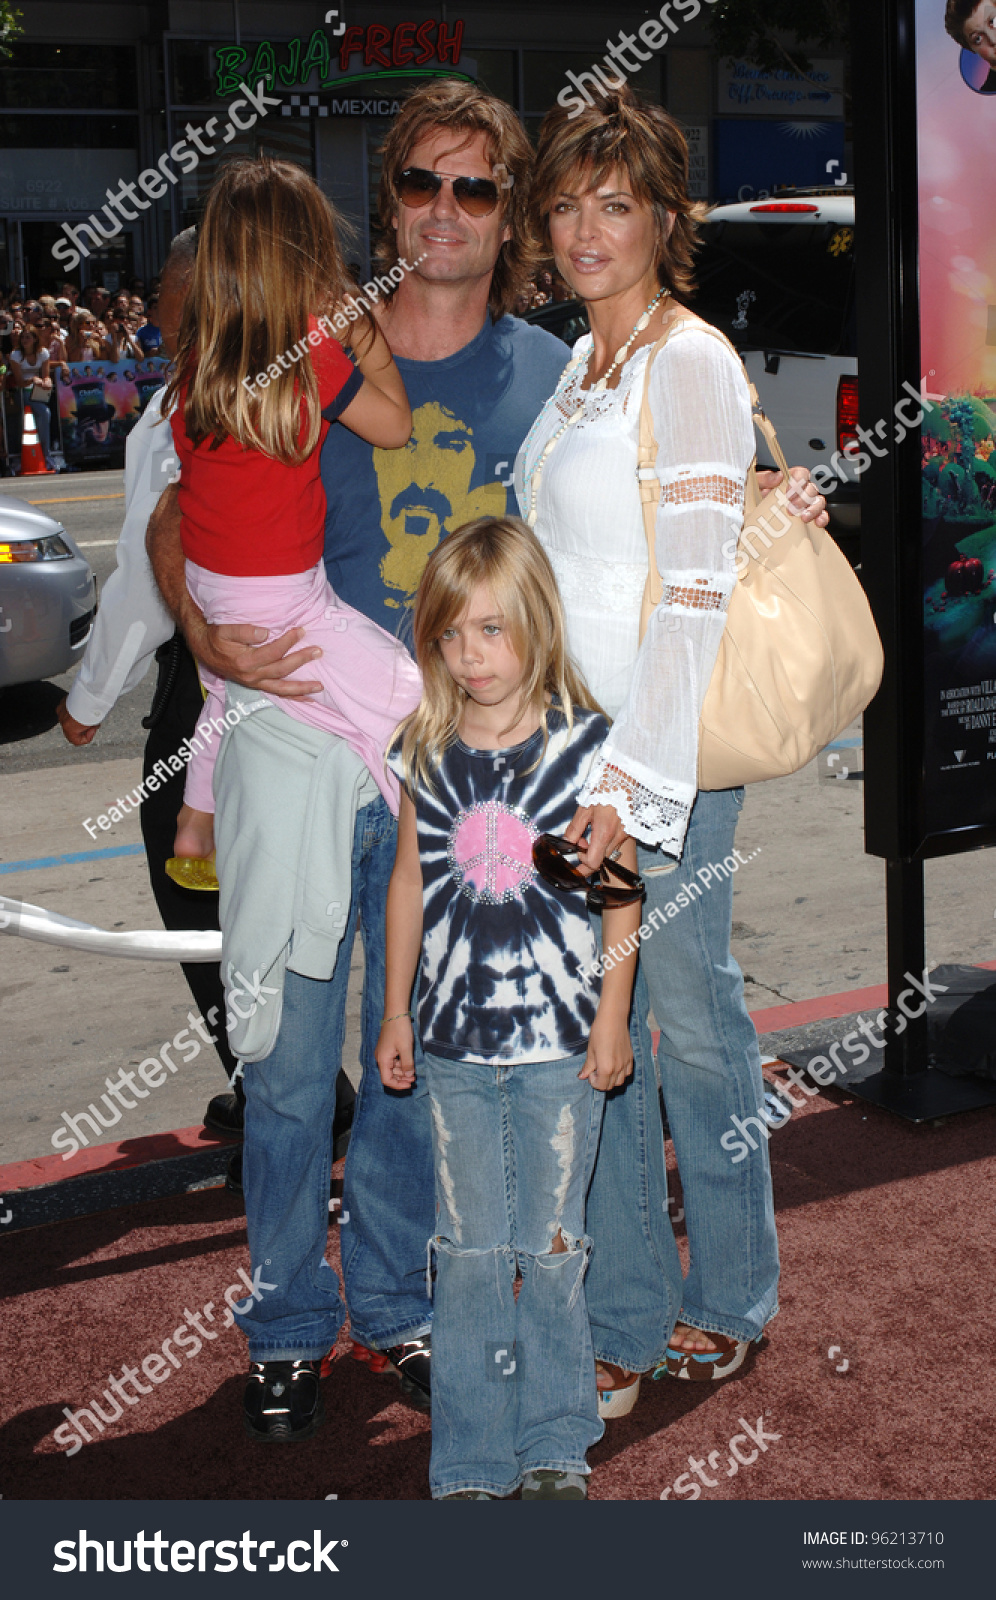 Forum on this topic: Kay Hammond (American actress), monica-mayhem/